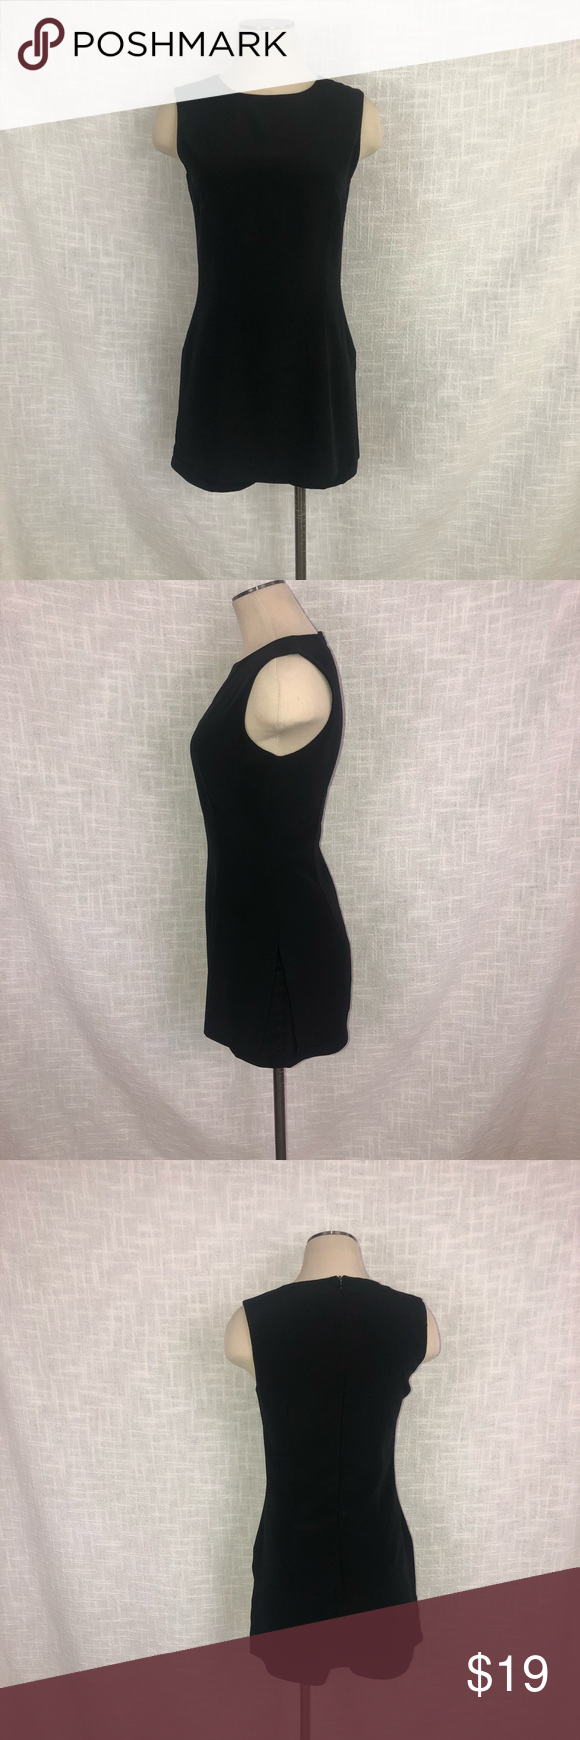 Black Costume With Shorts Beneath